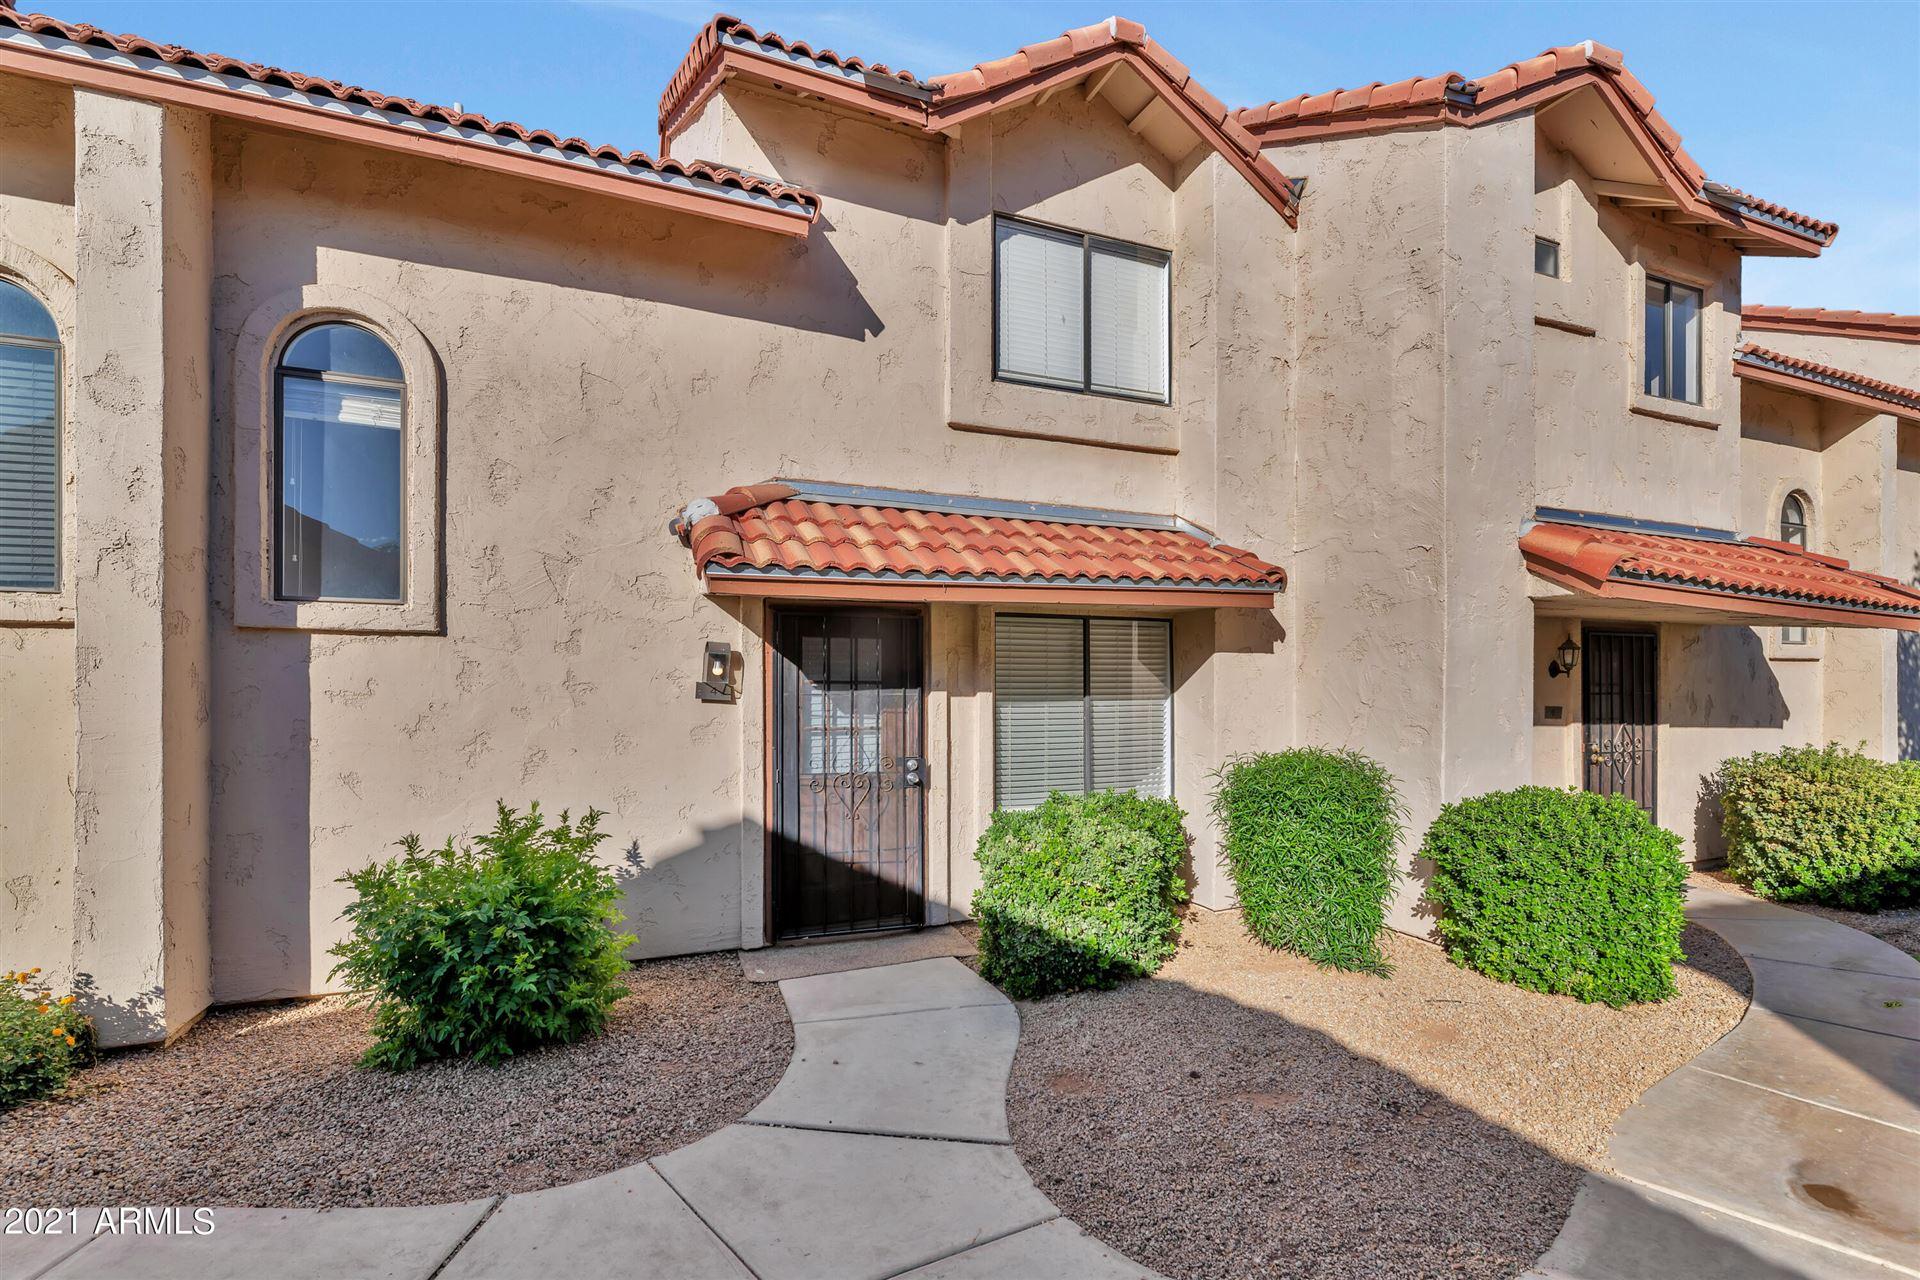 Photo of 2970 N Oregon Street #4, Chandler, AZ 85225 (MLS # 6311165)